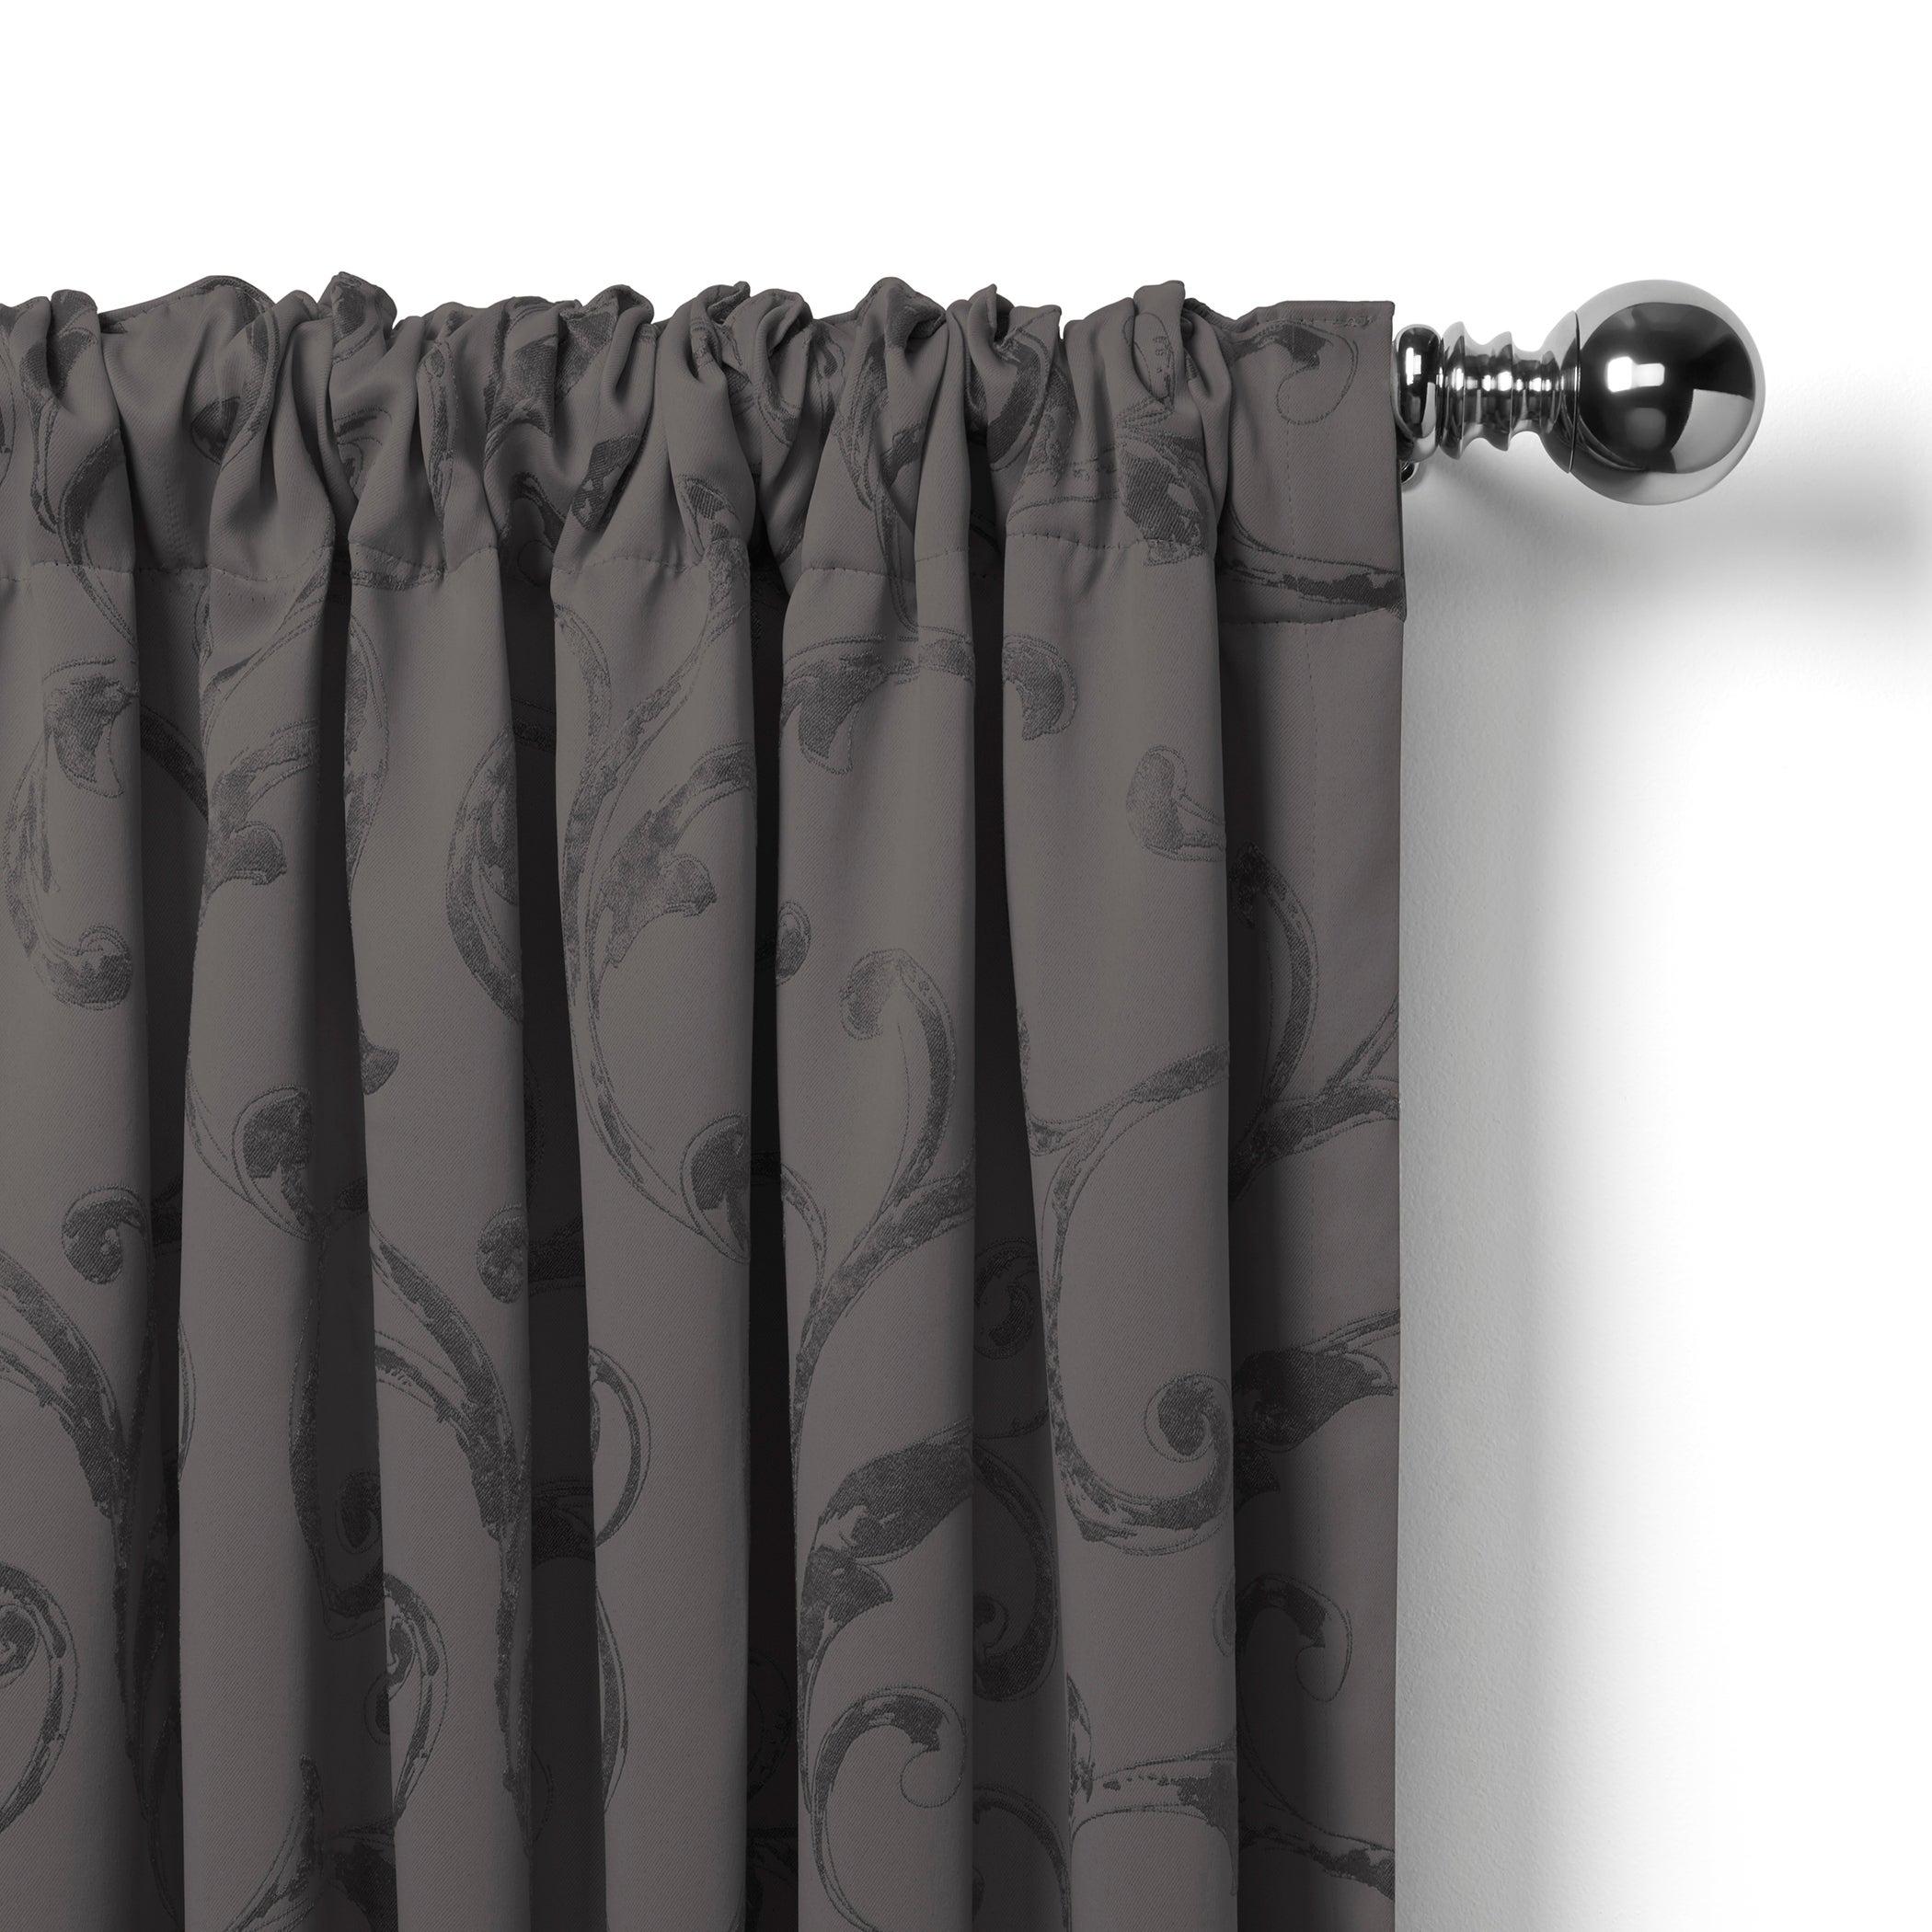 Elrene Mia Jacquard Blackout Curtain Panel Regarding Elrene Mia Jacquard Blackout Curtain Panels (View 4 of 20)